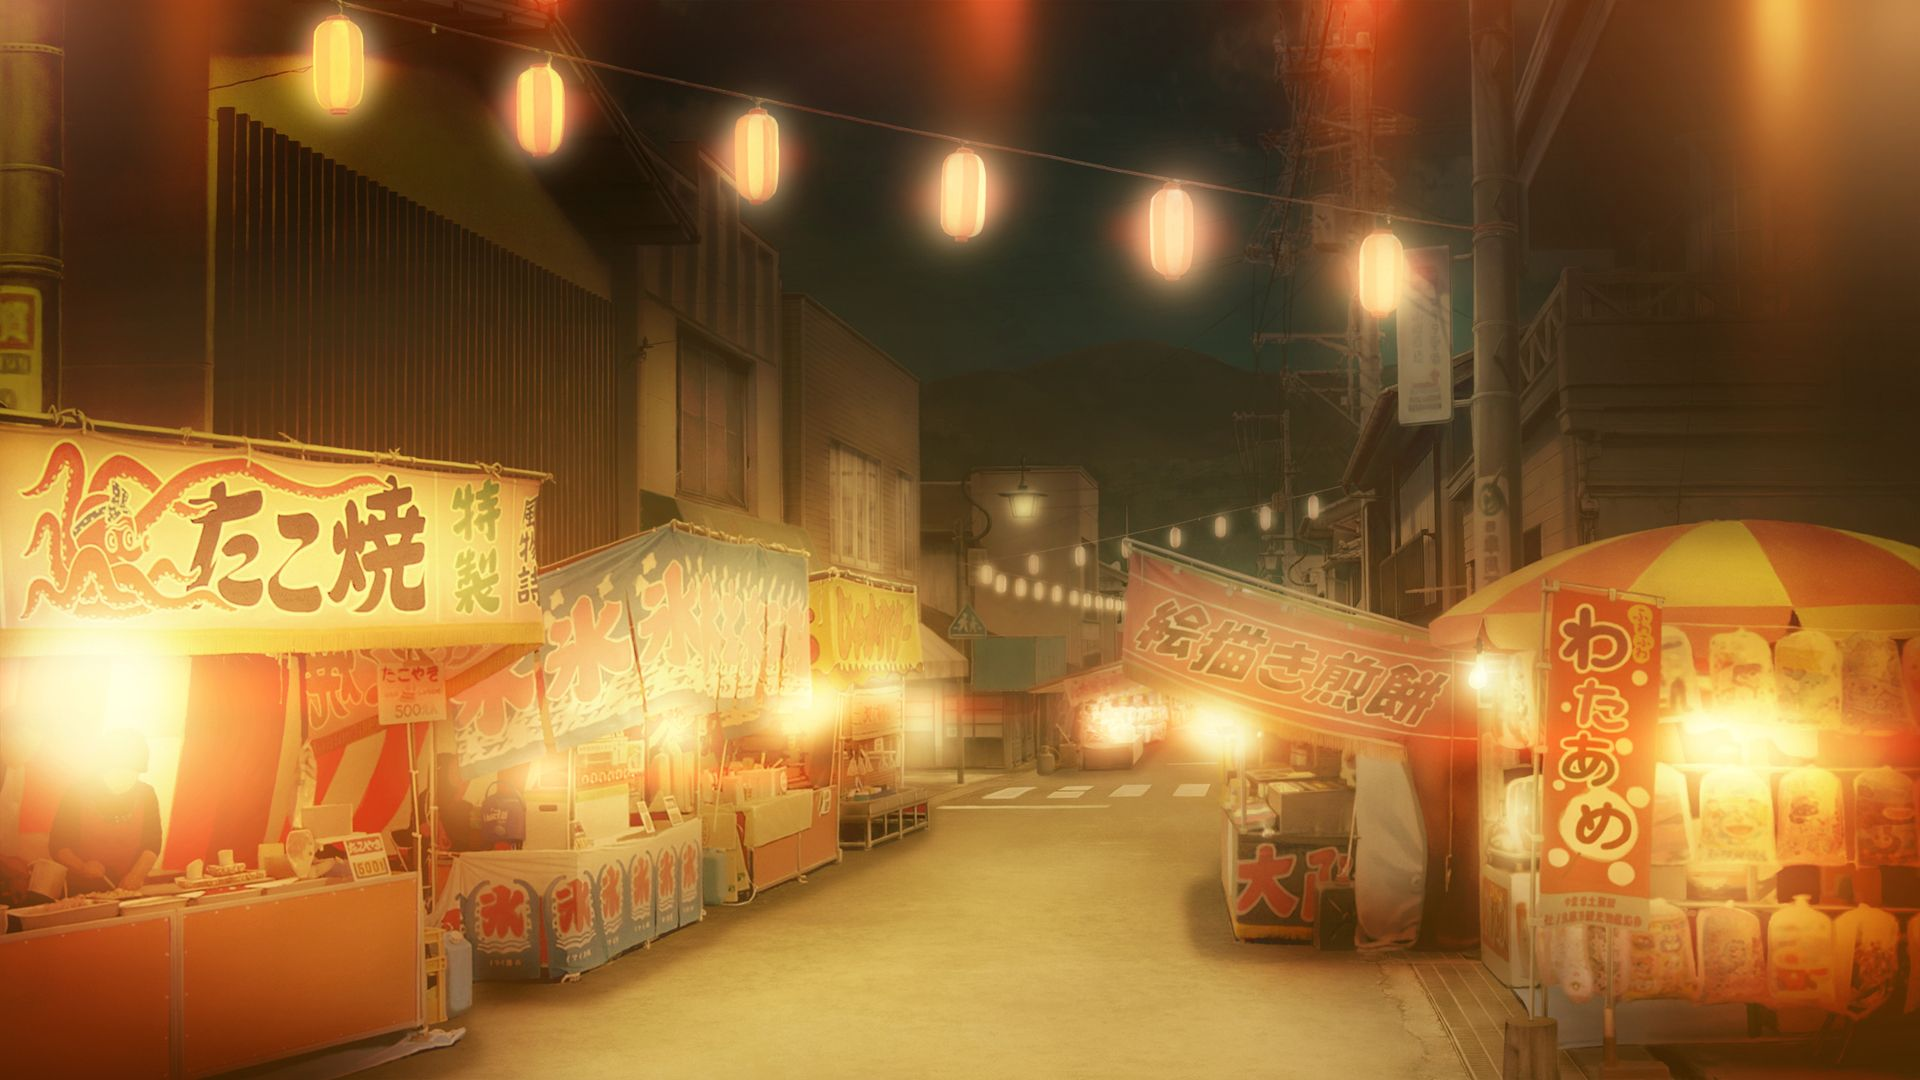 43516 Anime Scenery Japan Cityscape Jpg 1920 1080 Tempat